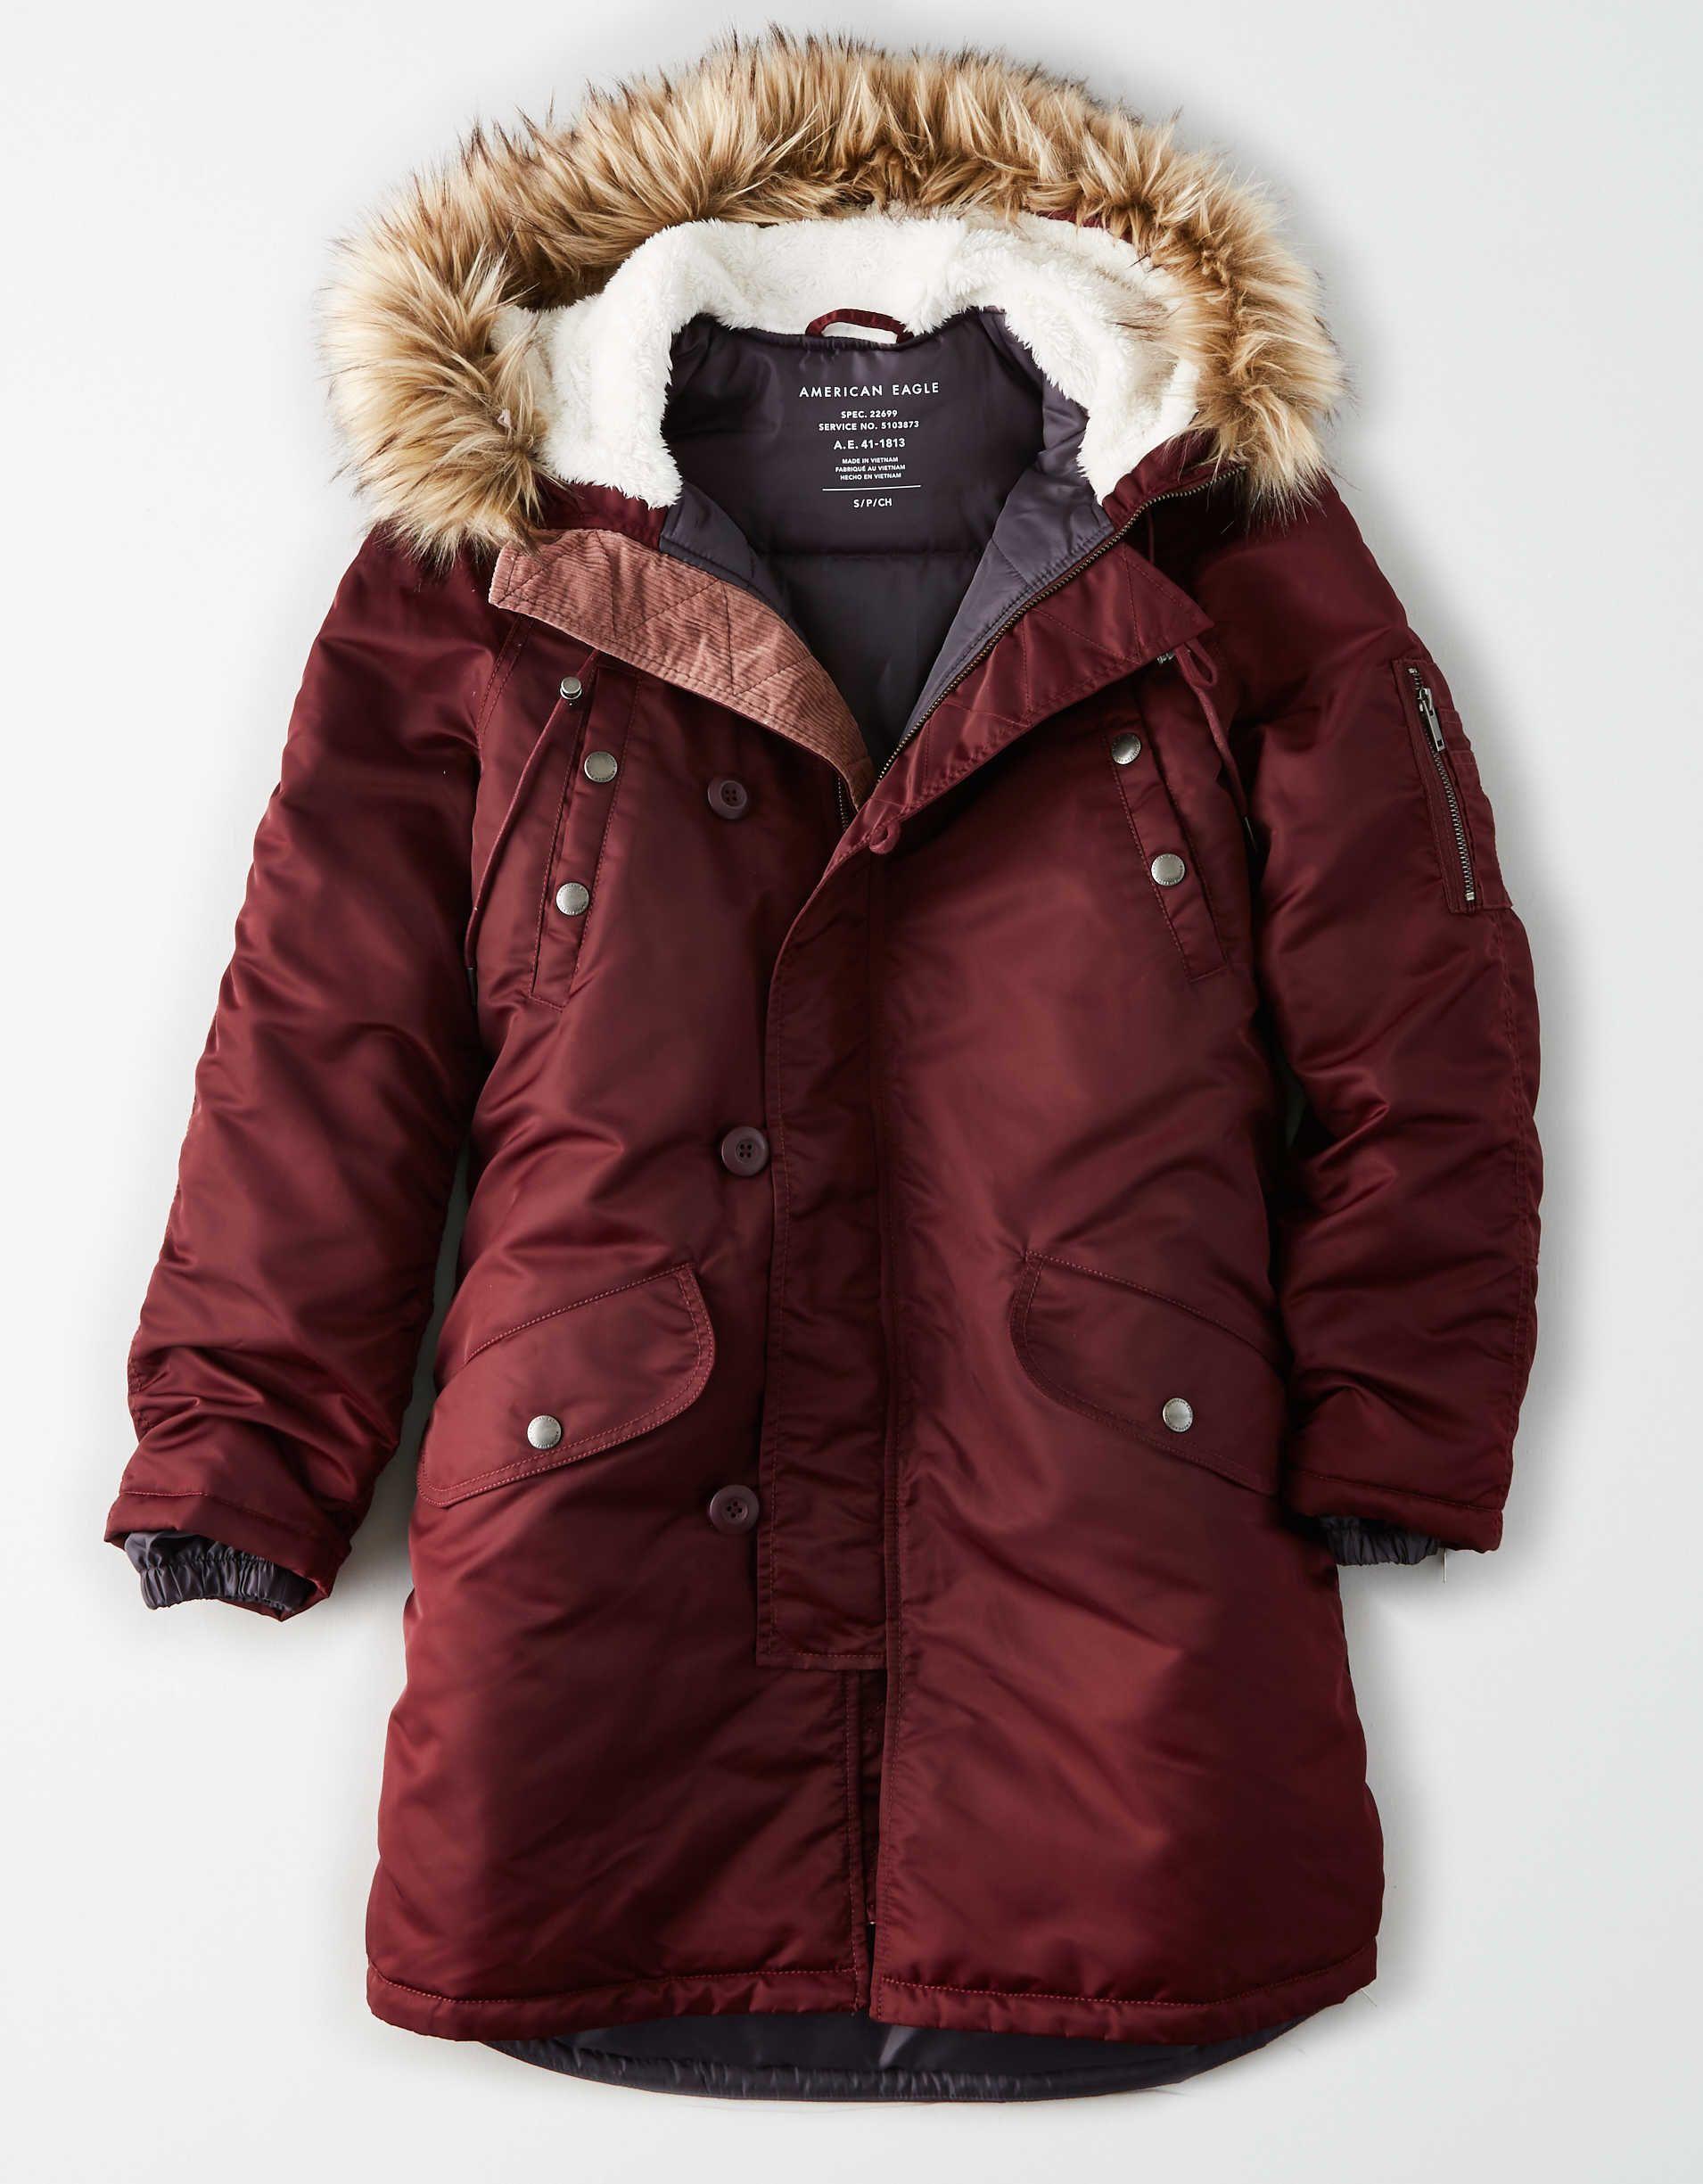 Ae Satin Parka Shop Womens Jackets Mens Outfitters Coats Jackets Women [ 2449 x 1910 Pixel ]